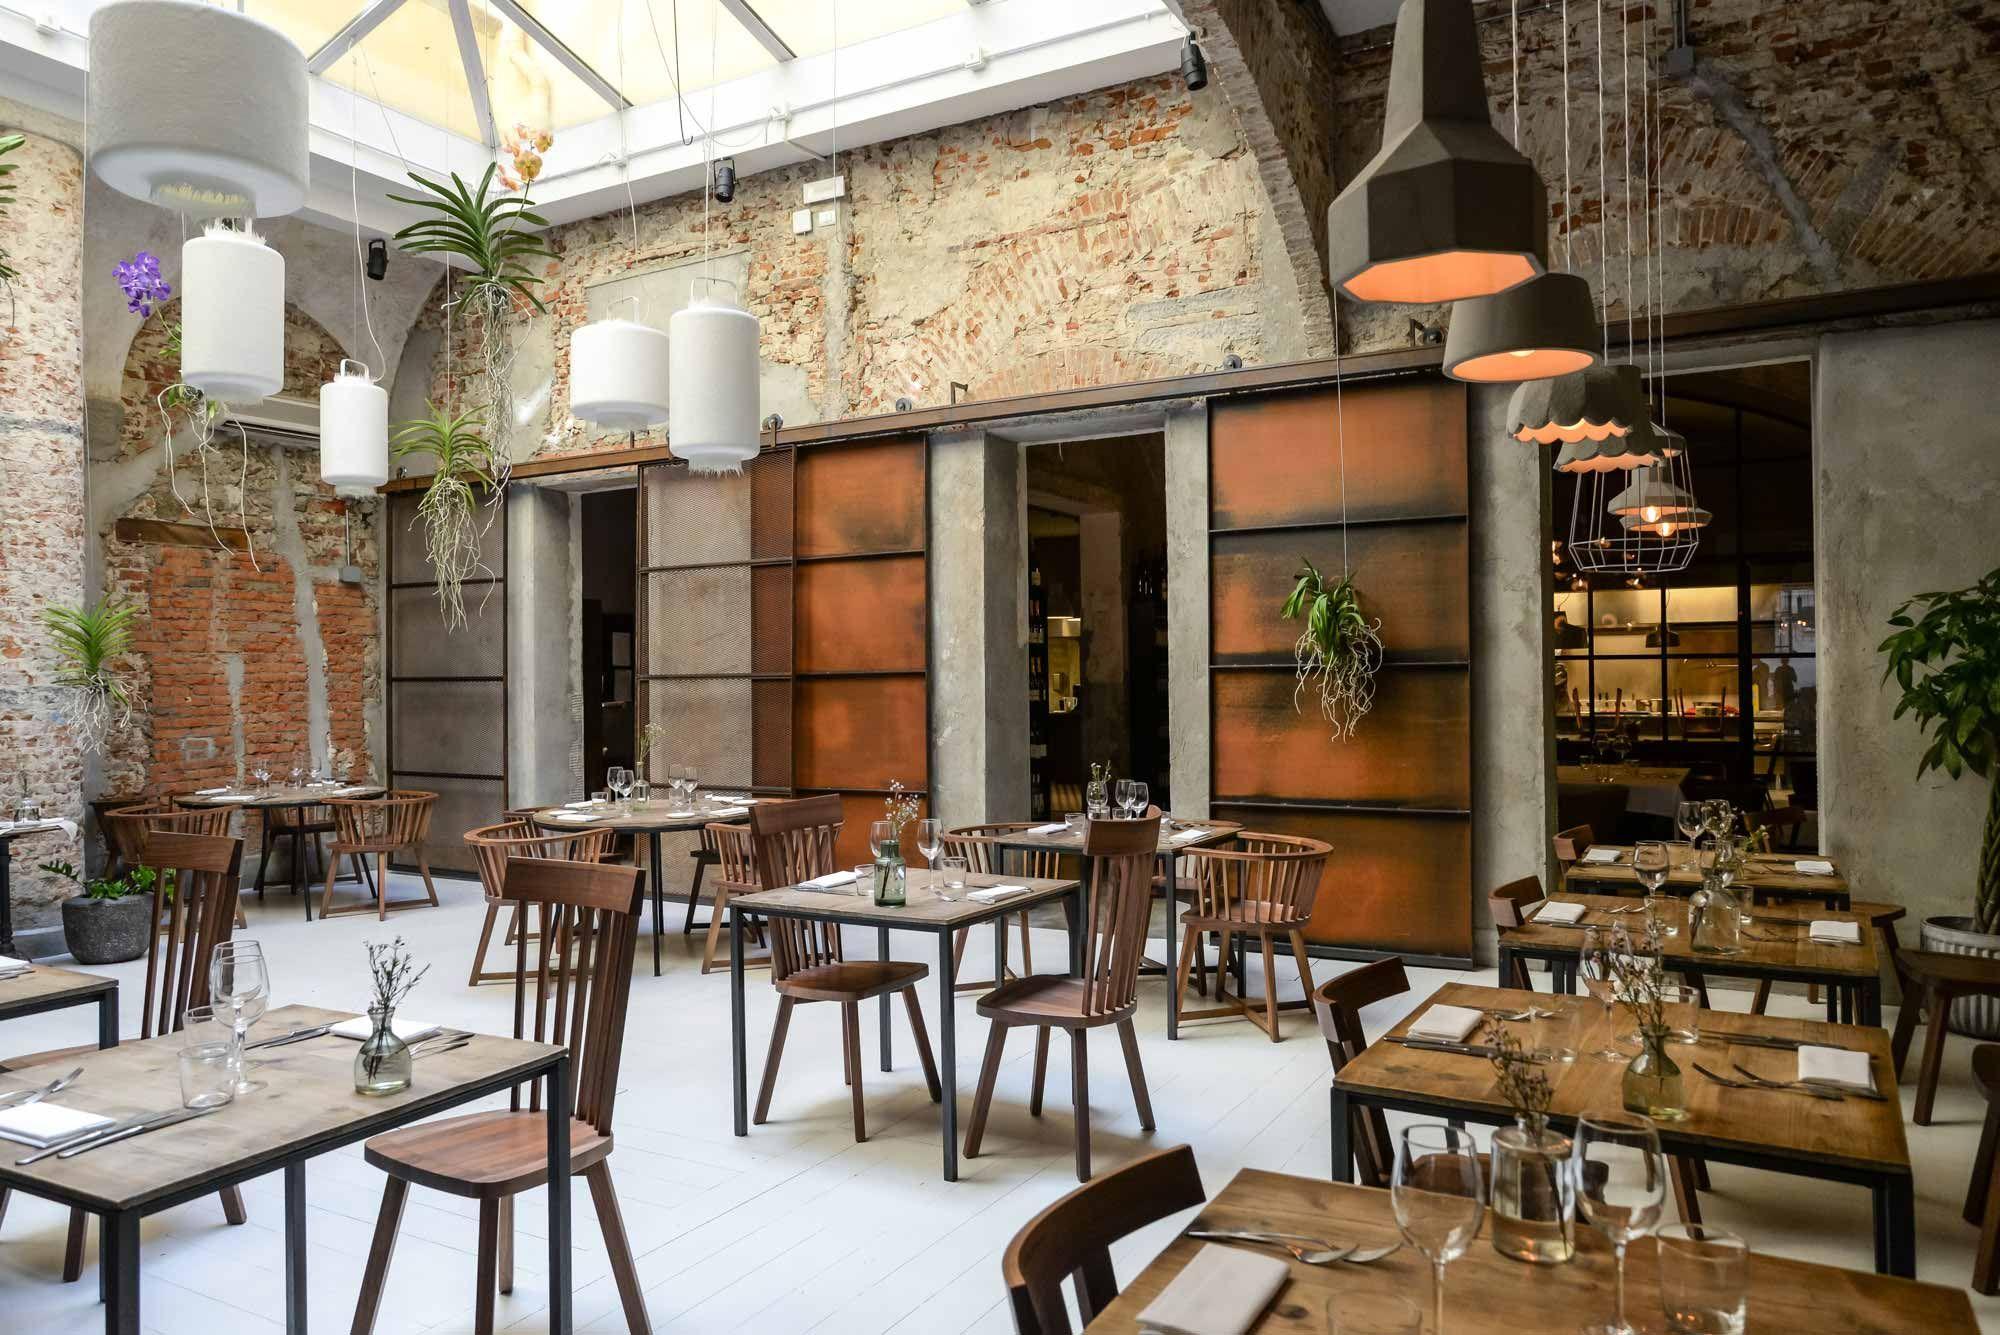 Restaurant toscane inspirerende concepten pinterest spaces